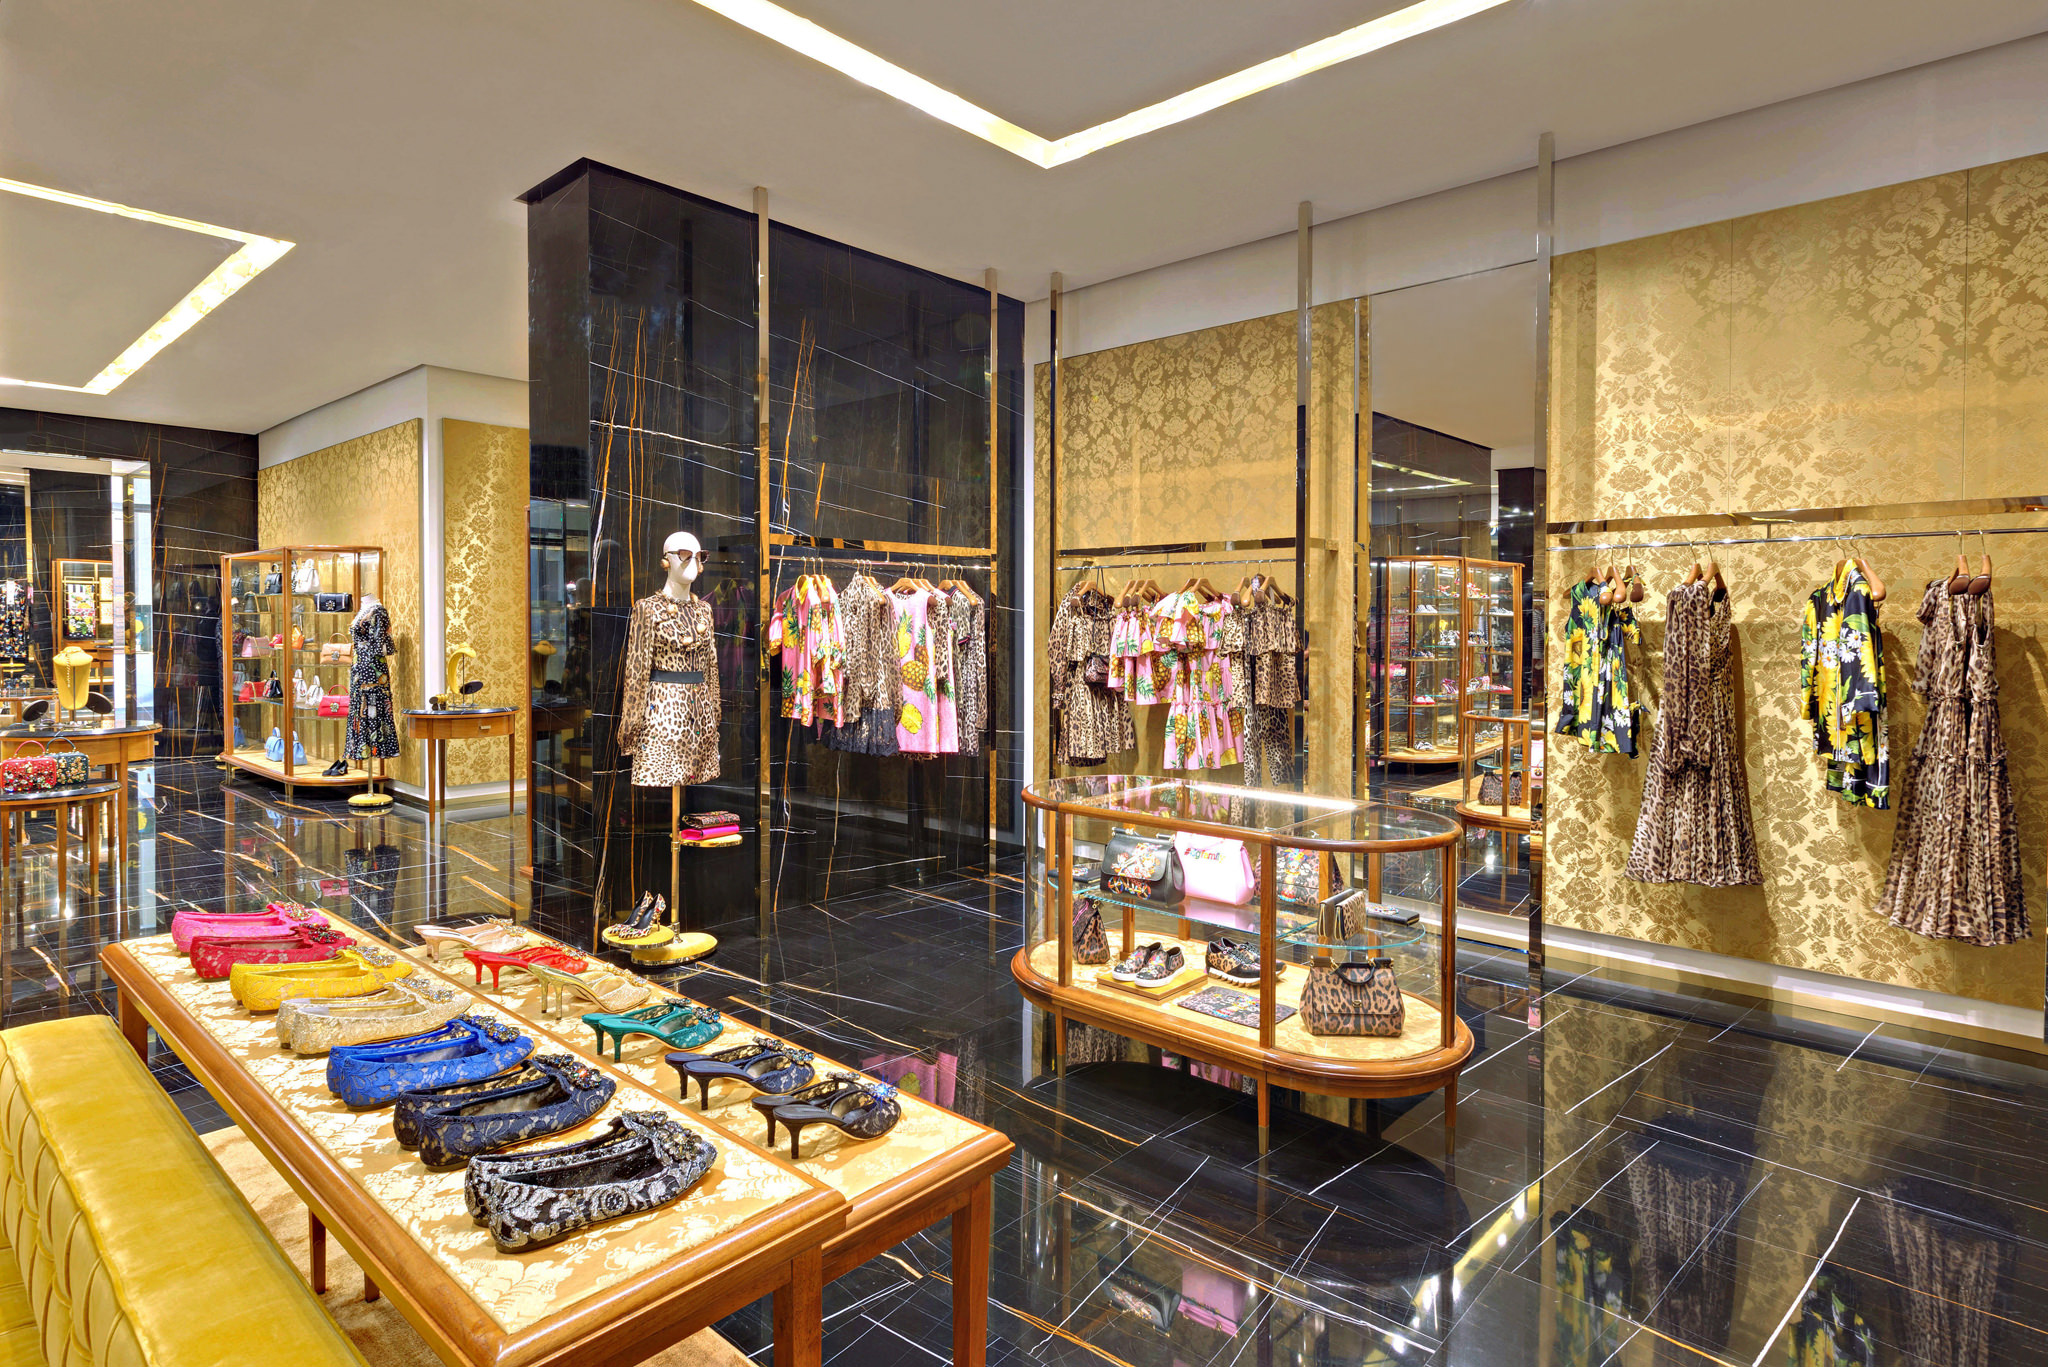 20170519 - Dolce & Gabbana - HCM - Commercial - Interior - Store - Retouch 0007.jpg